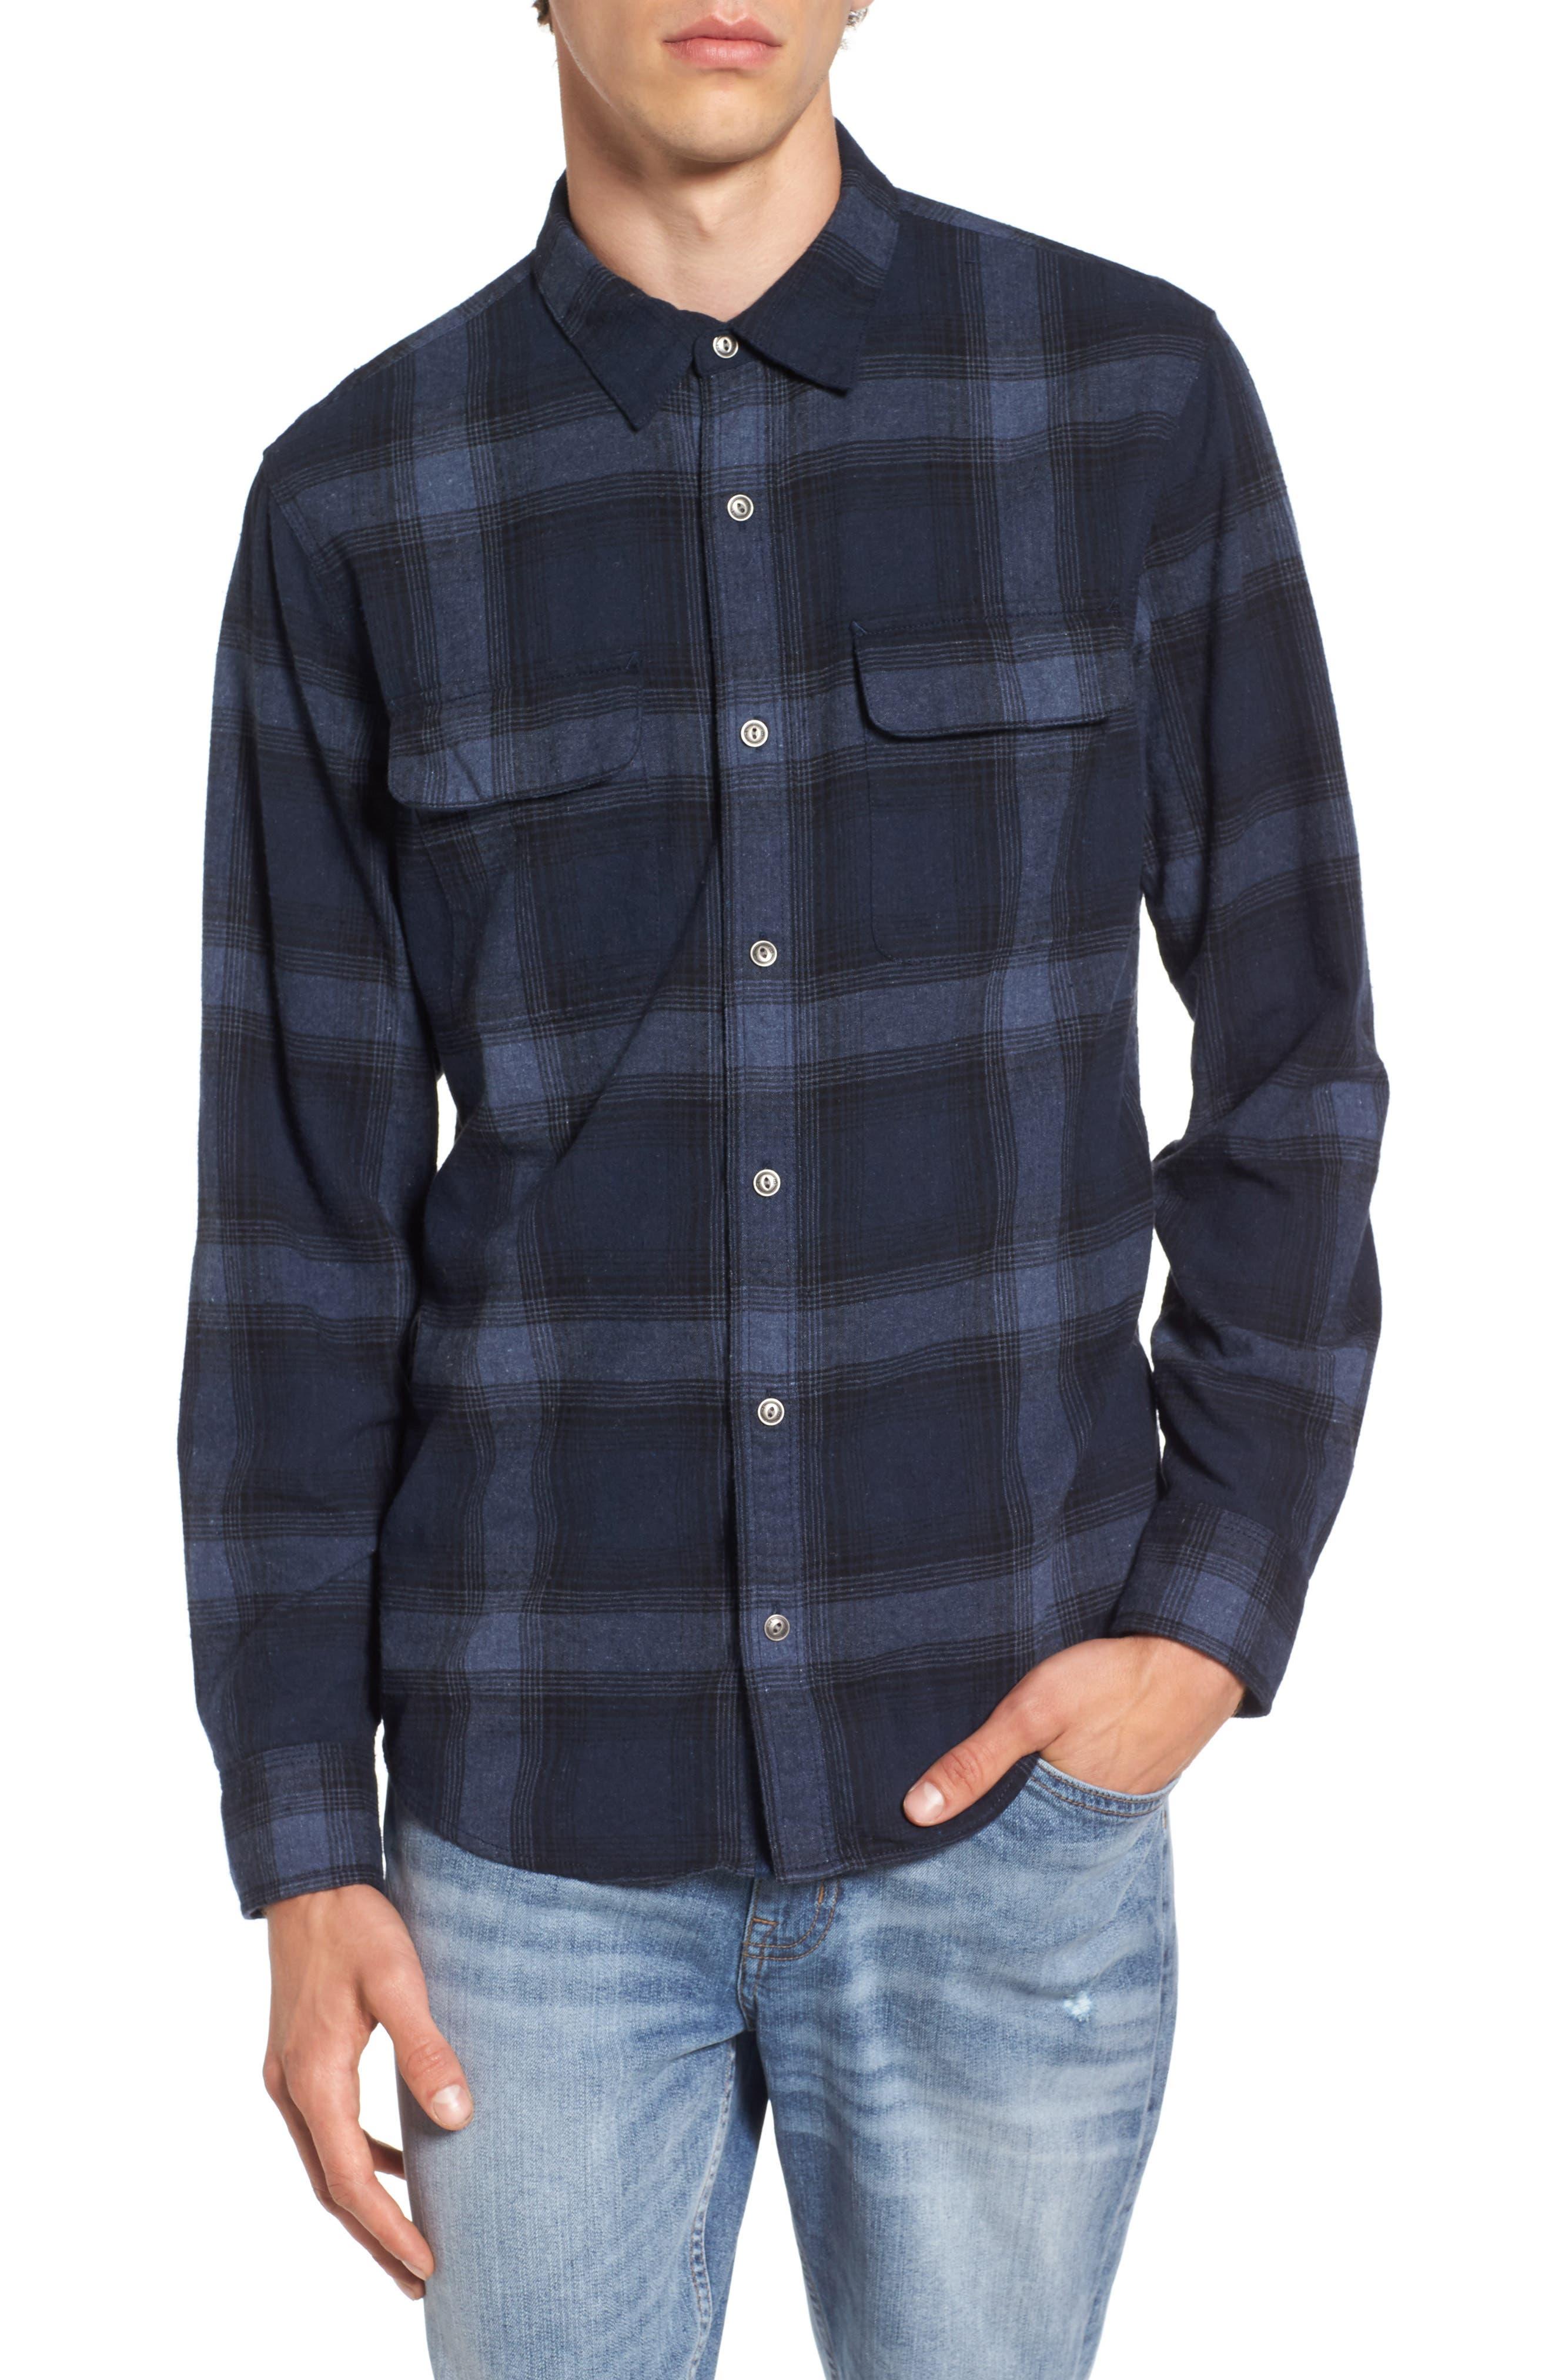 Treasure & Bond Owen Plaid Flannel Sport Shirt